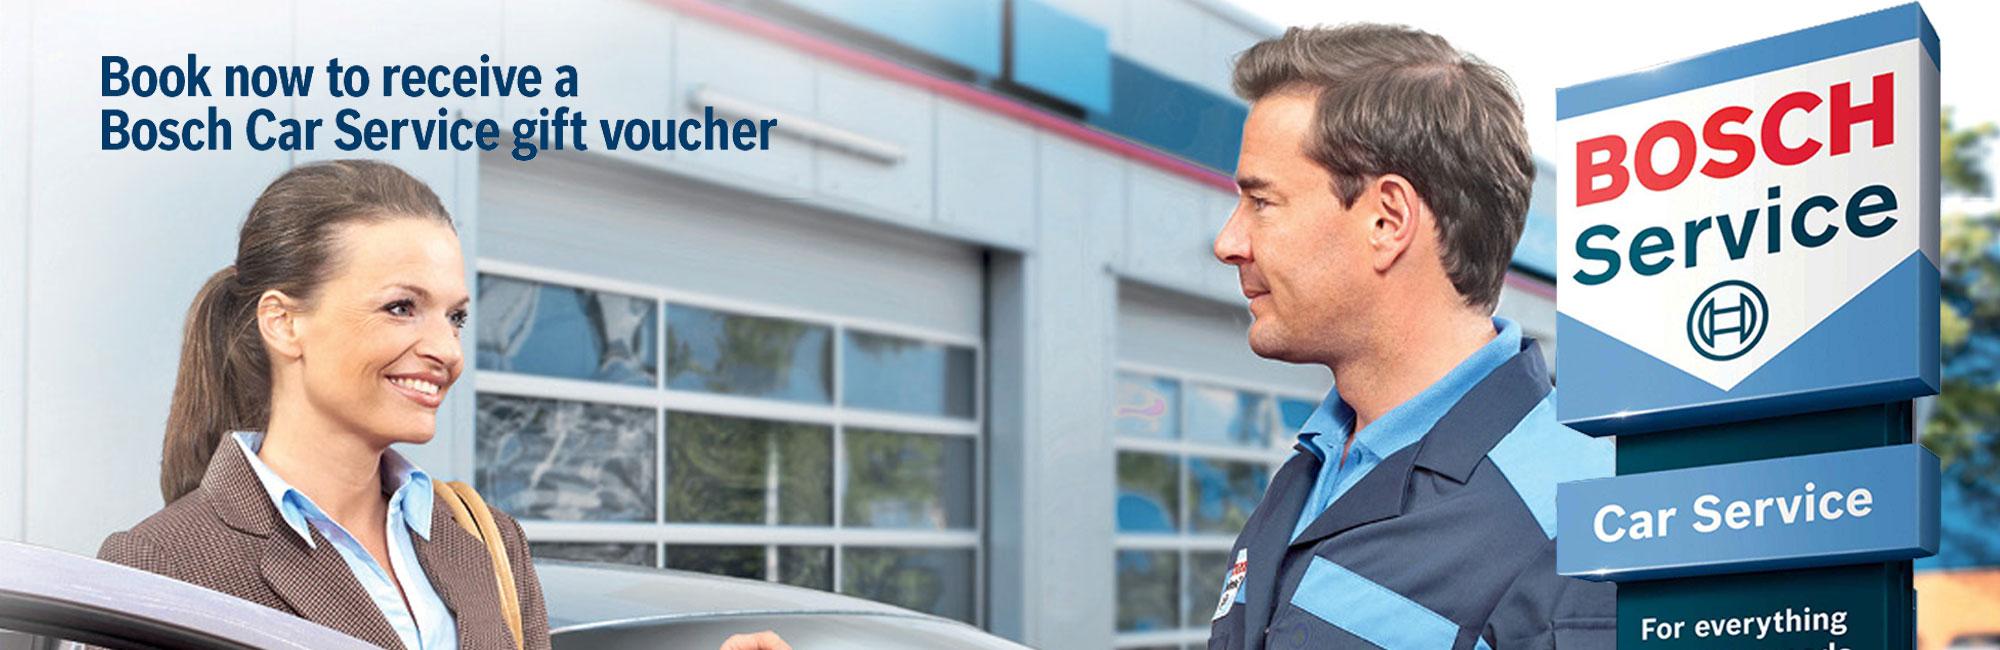 Bosch services Contact